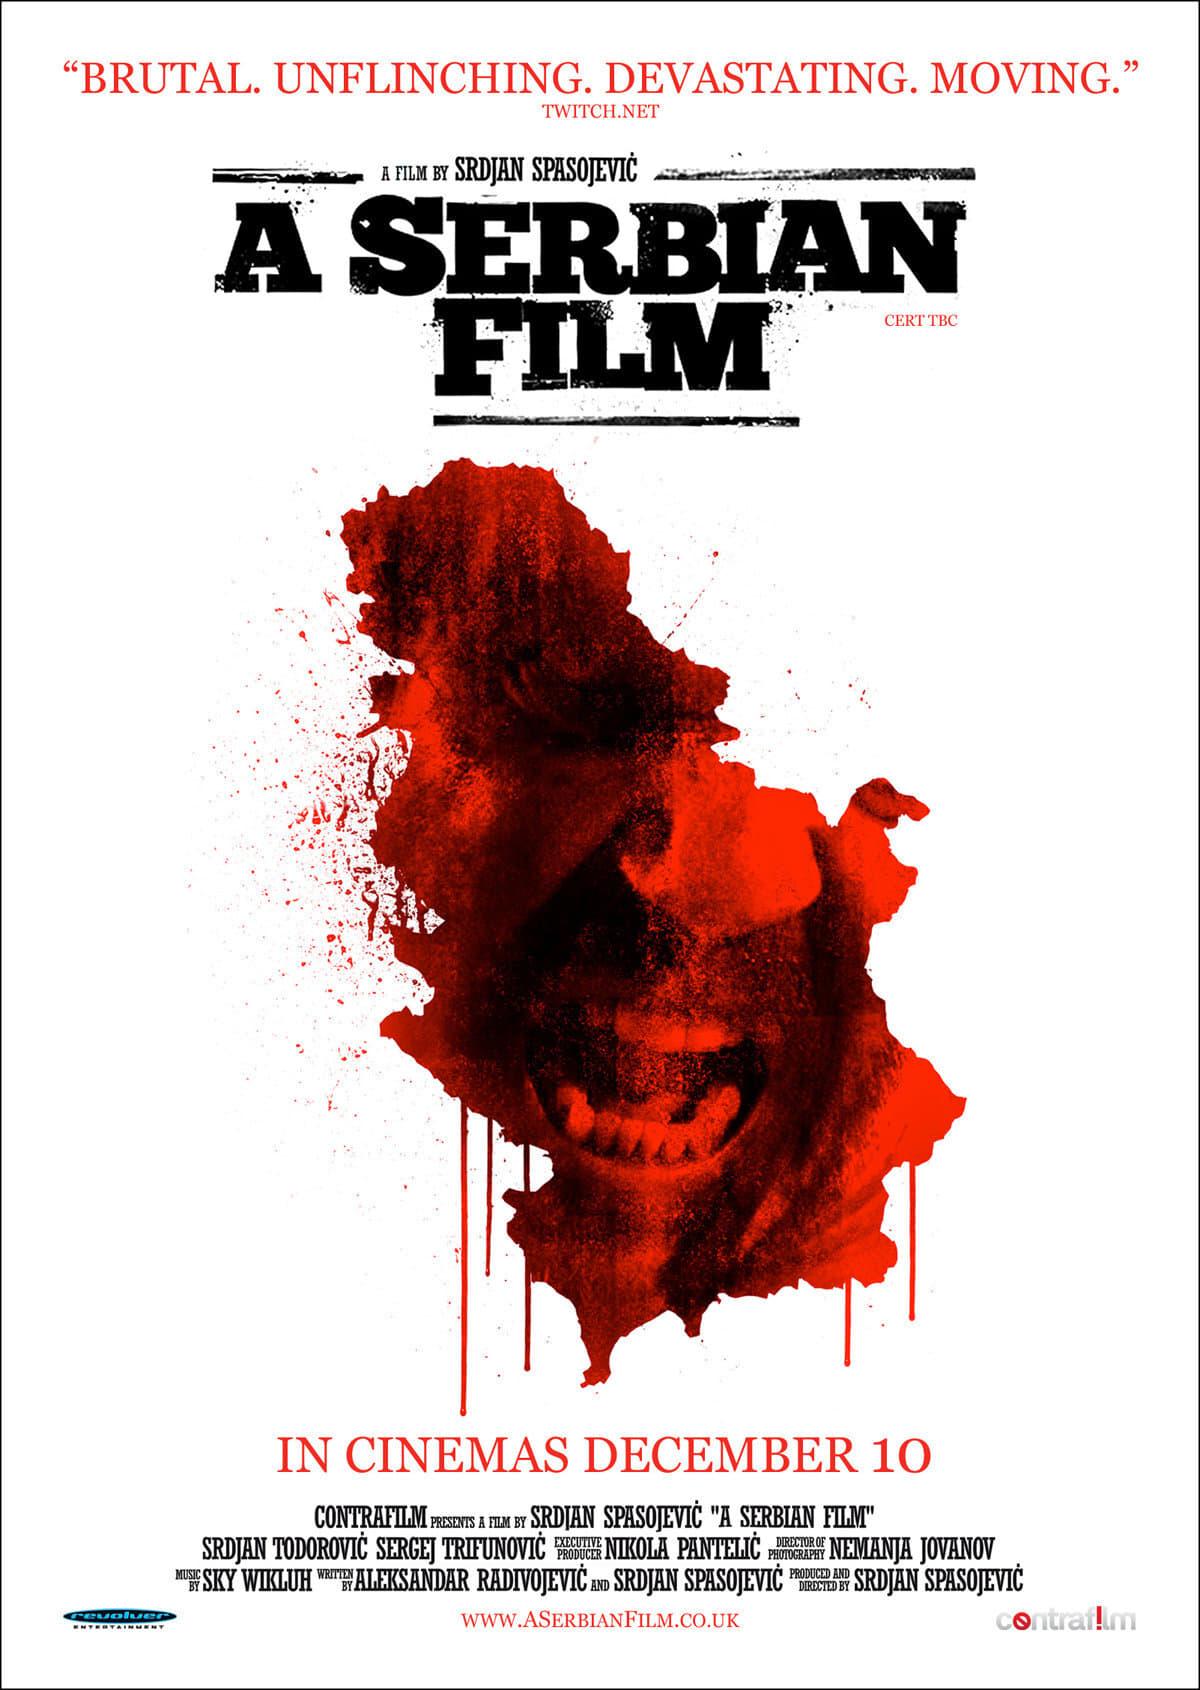 Cannibal Holocaust 1980 (Watch Full Movie) - OpenloadMovies